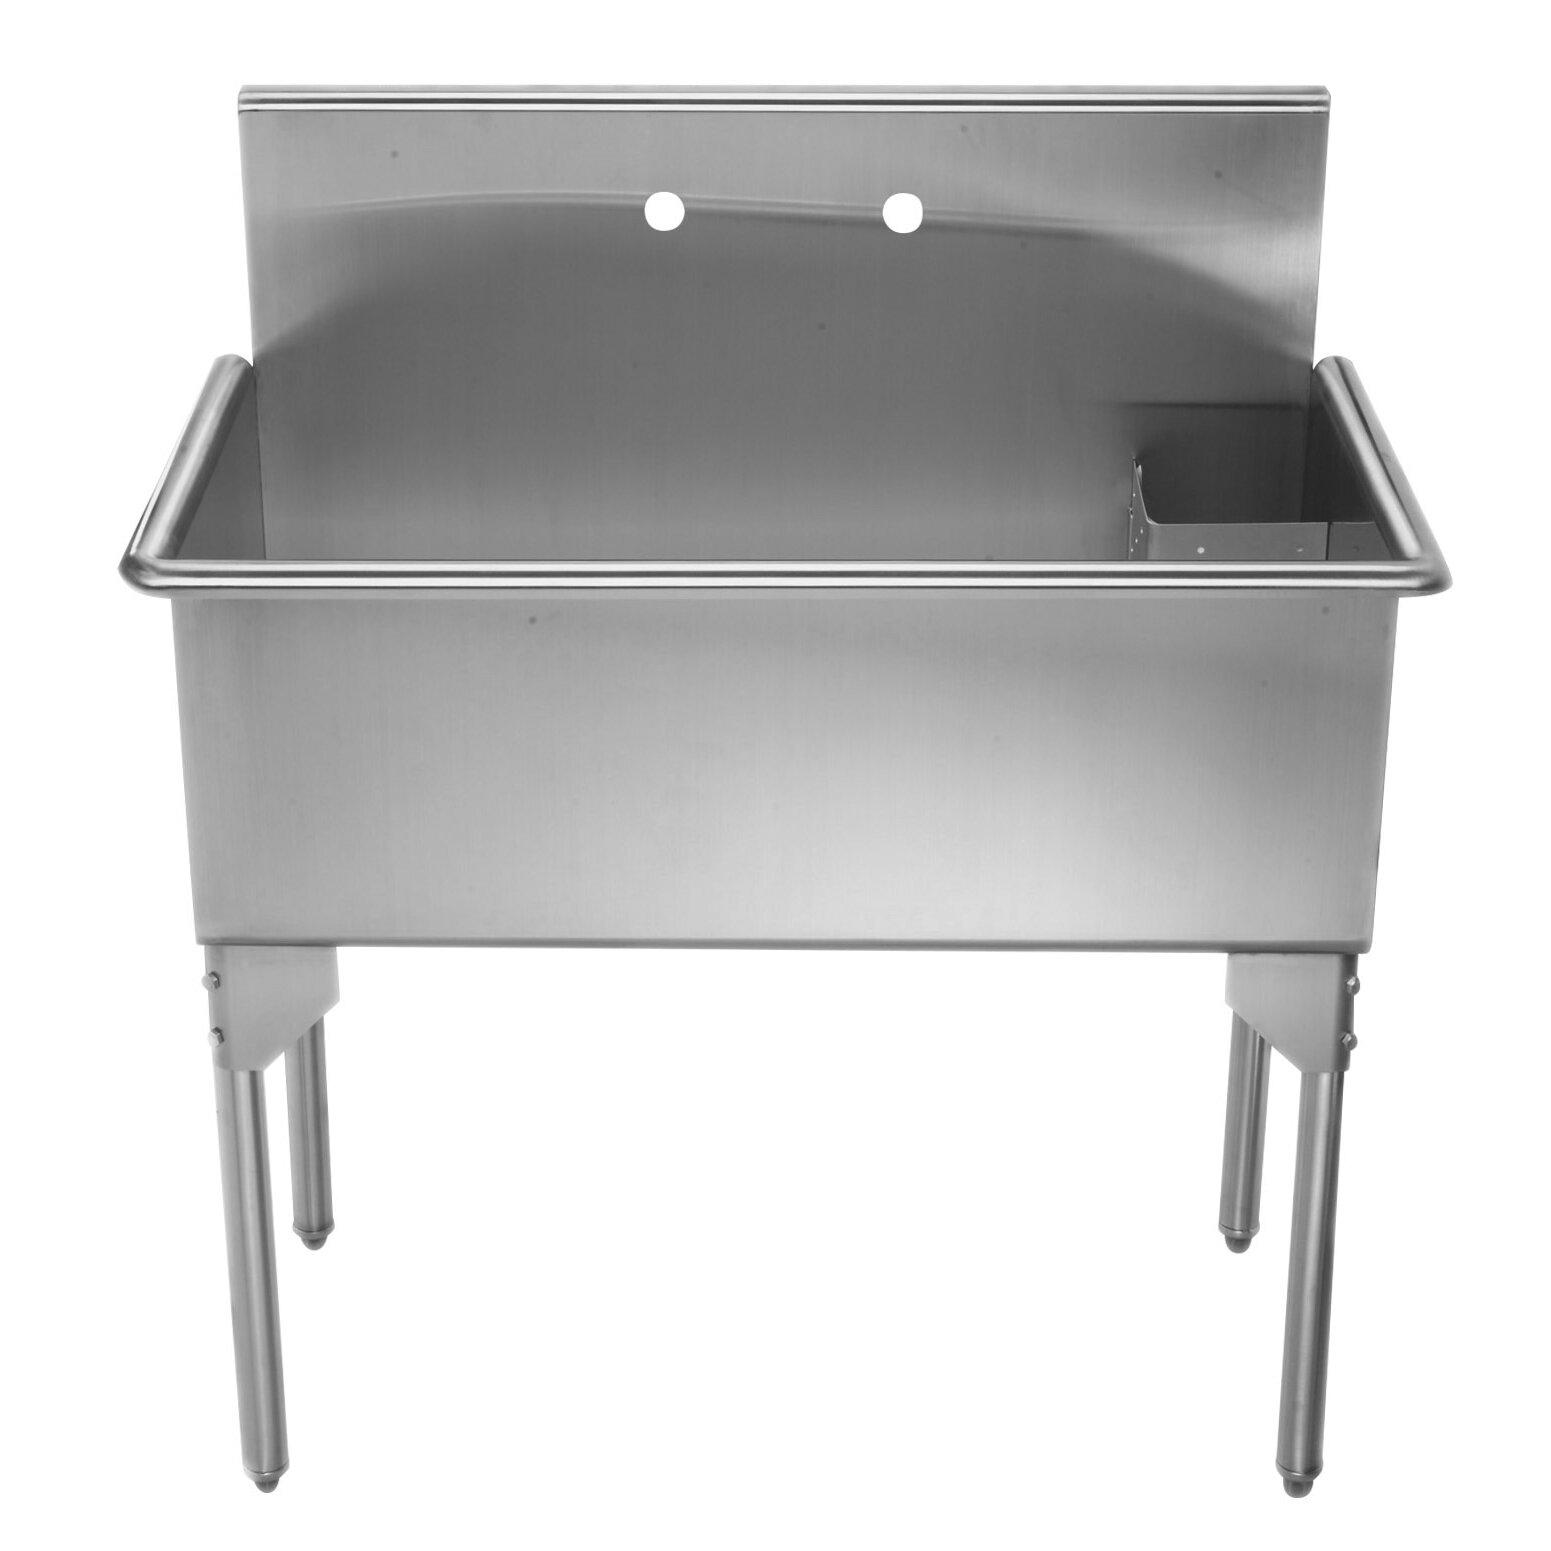 Freestanding Utility Sink : ... 39